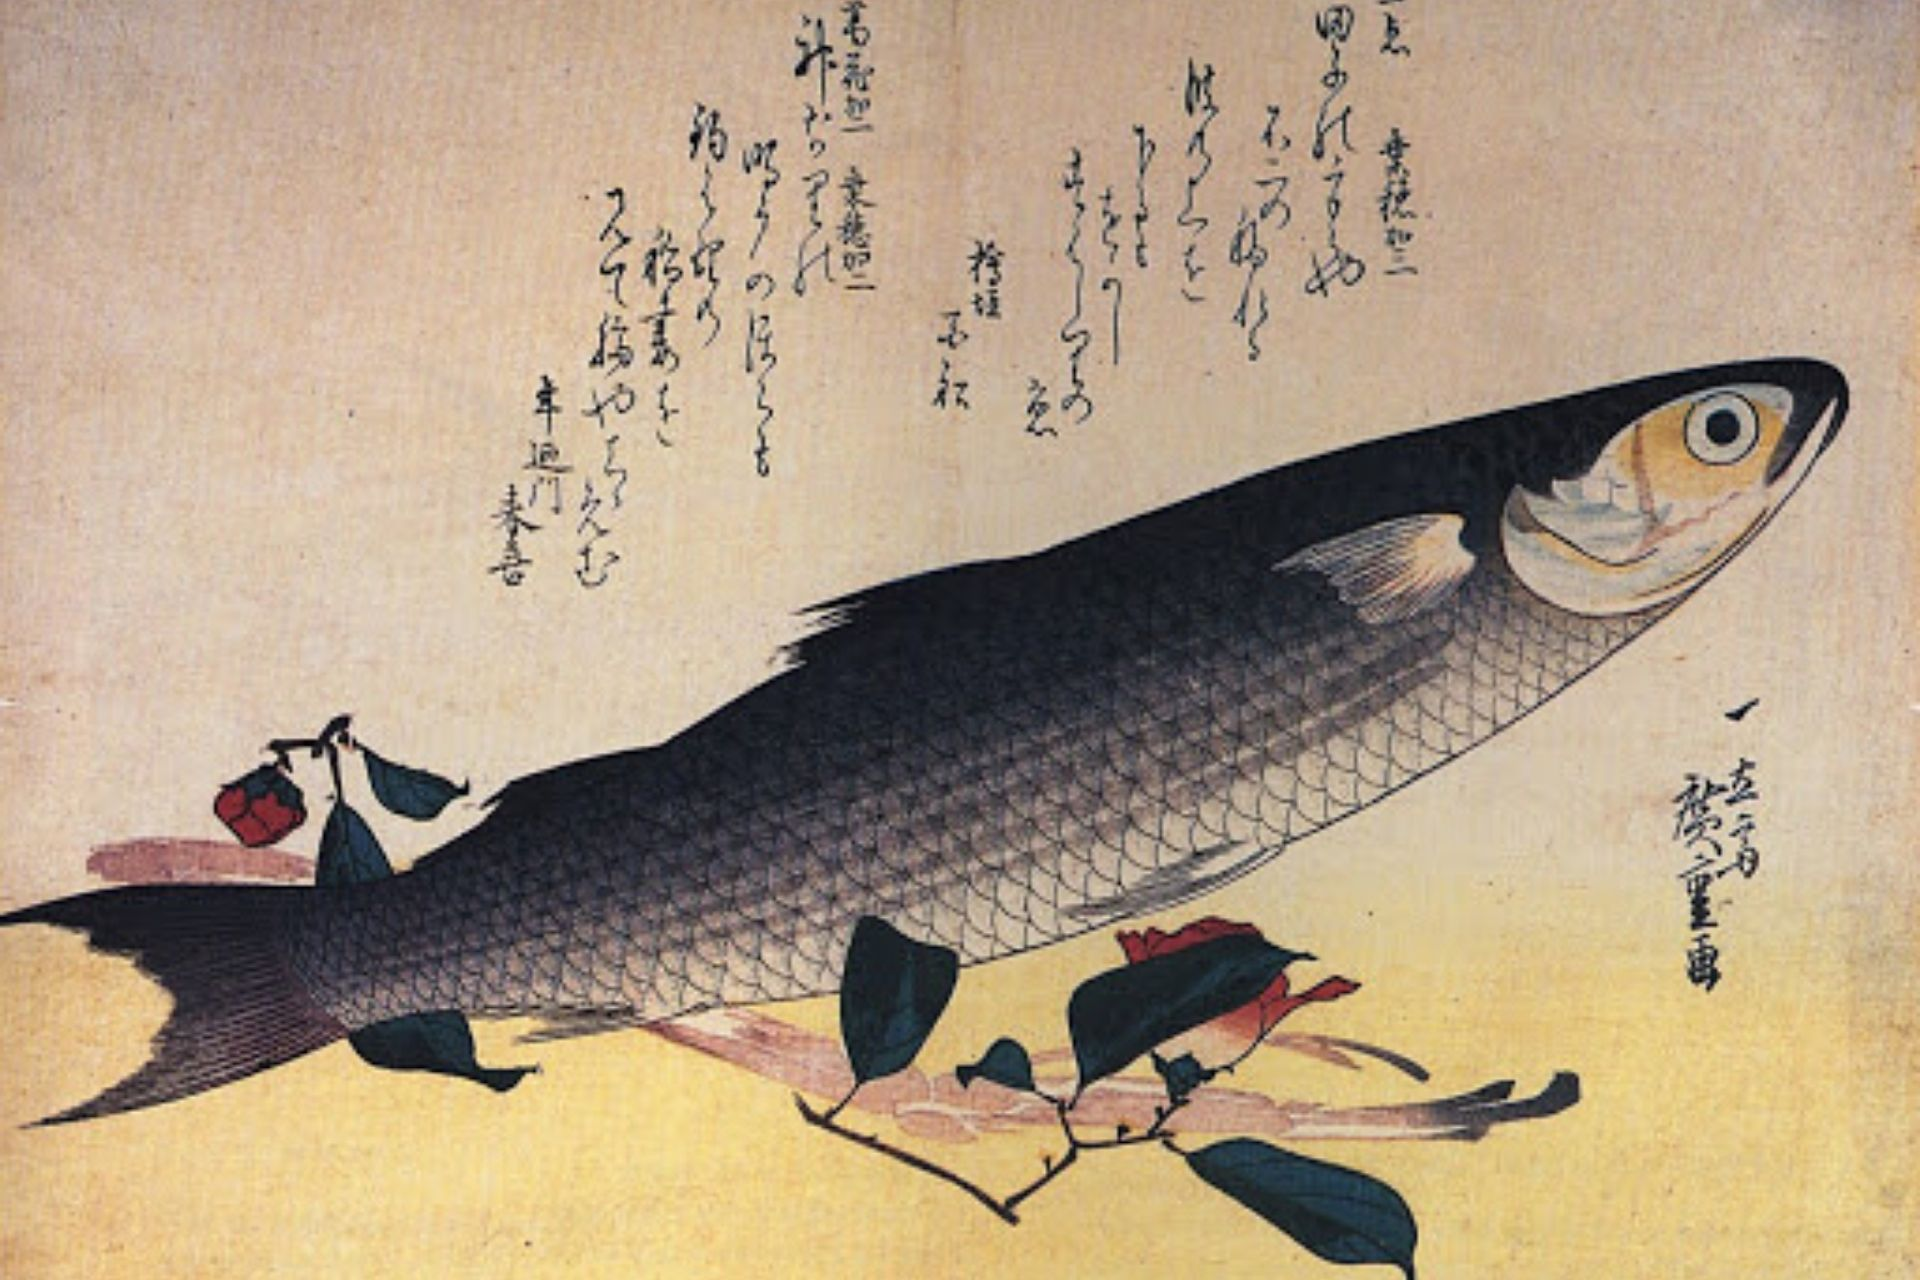 Mostra Hokusai, Hiroshige, Utamaro. Luoghi e volti del Giappone Milano